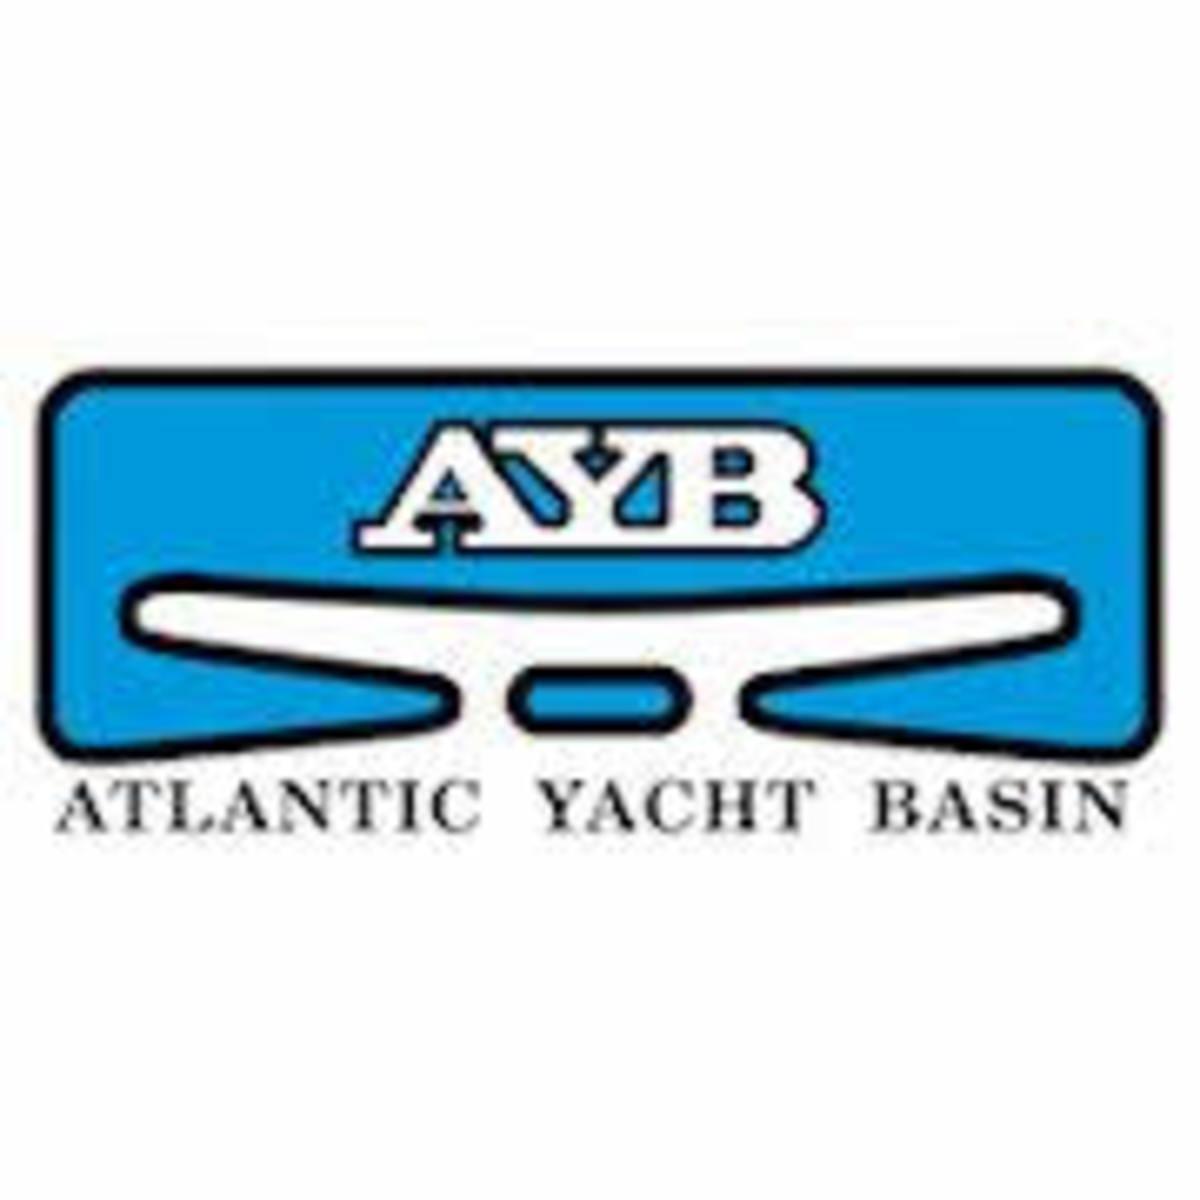 atlantic yacht basin